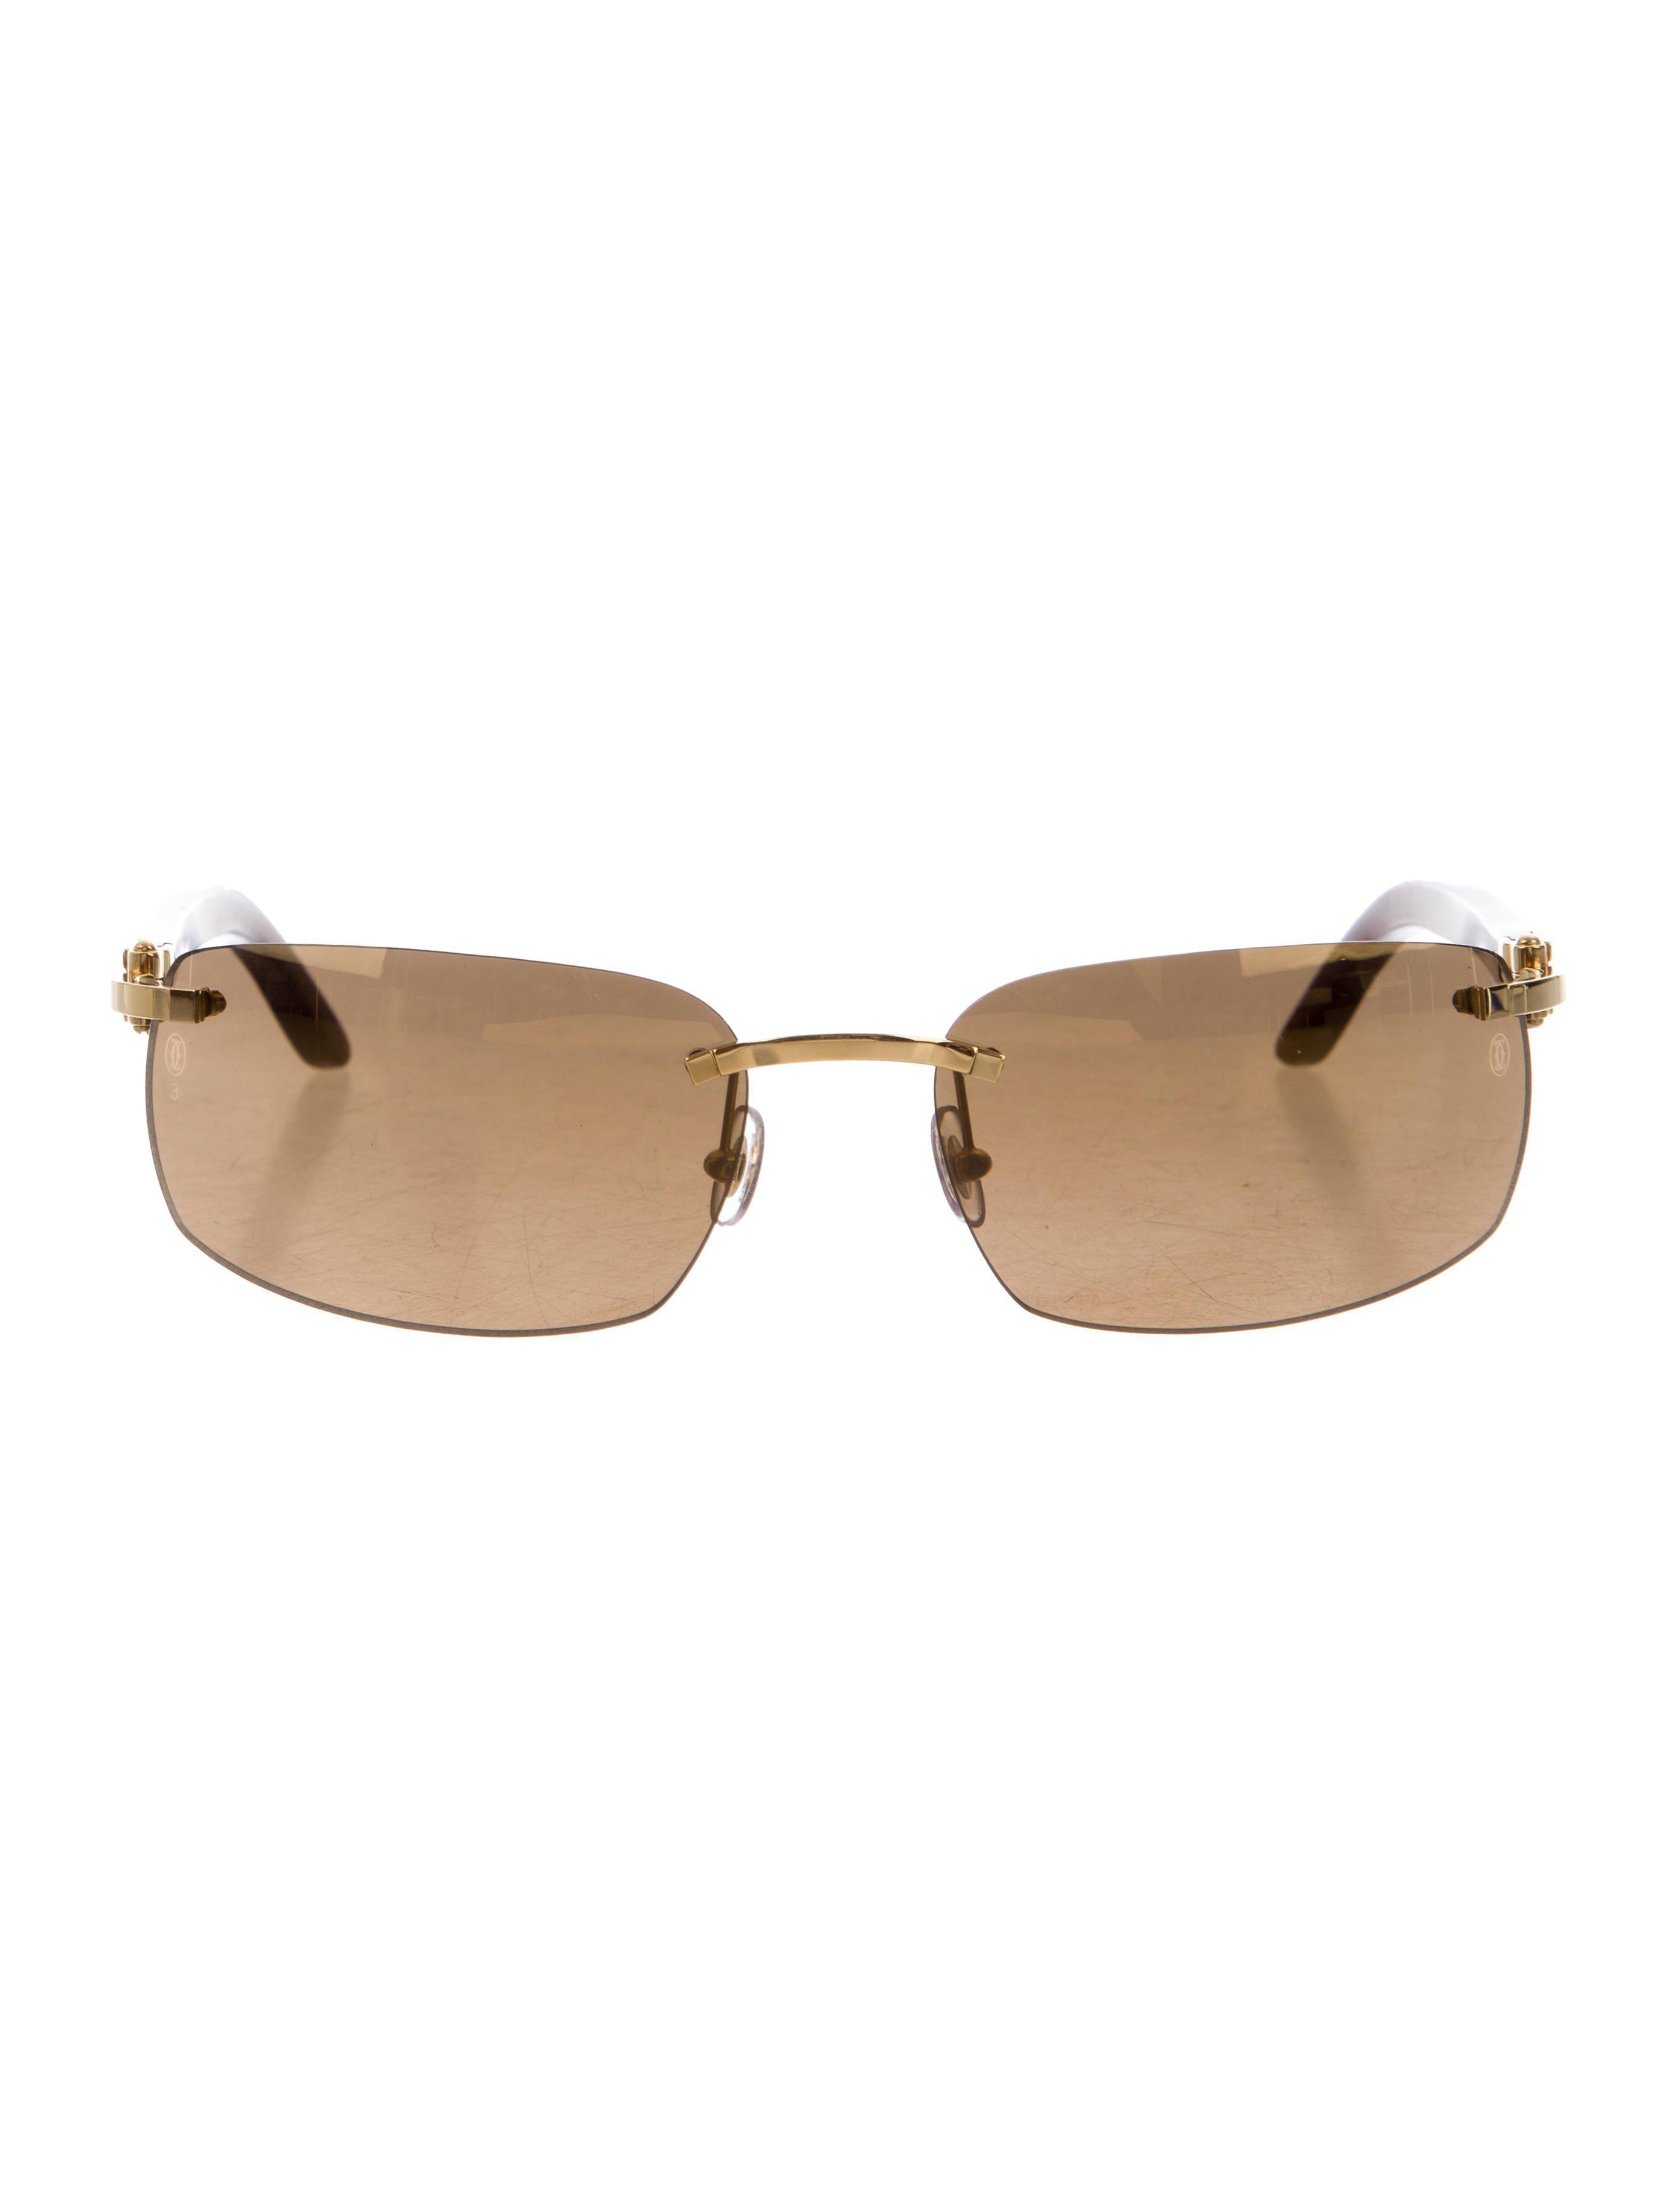 378688290ca Lyst - Cartier Reflective Rimless Sunglasses Gold in Metallic